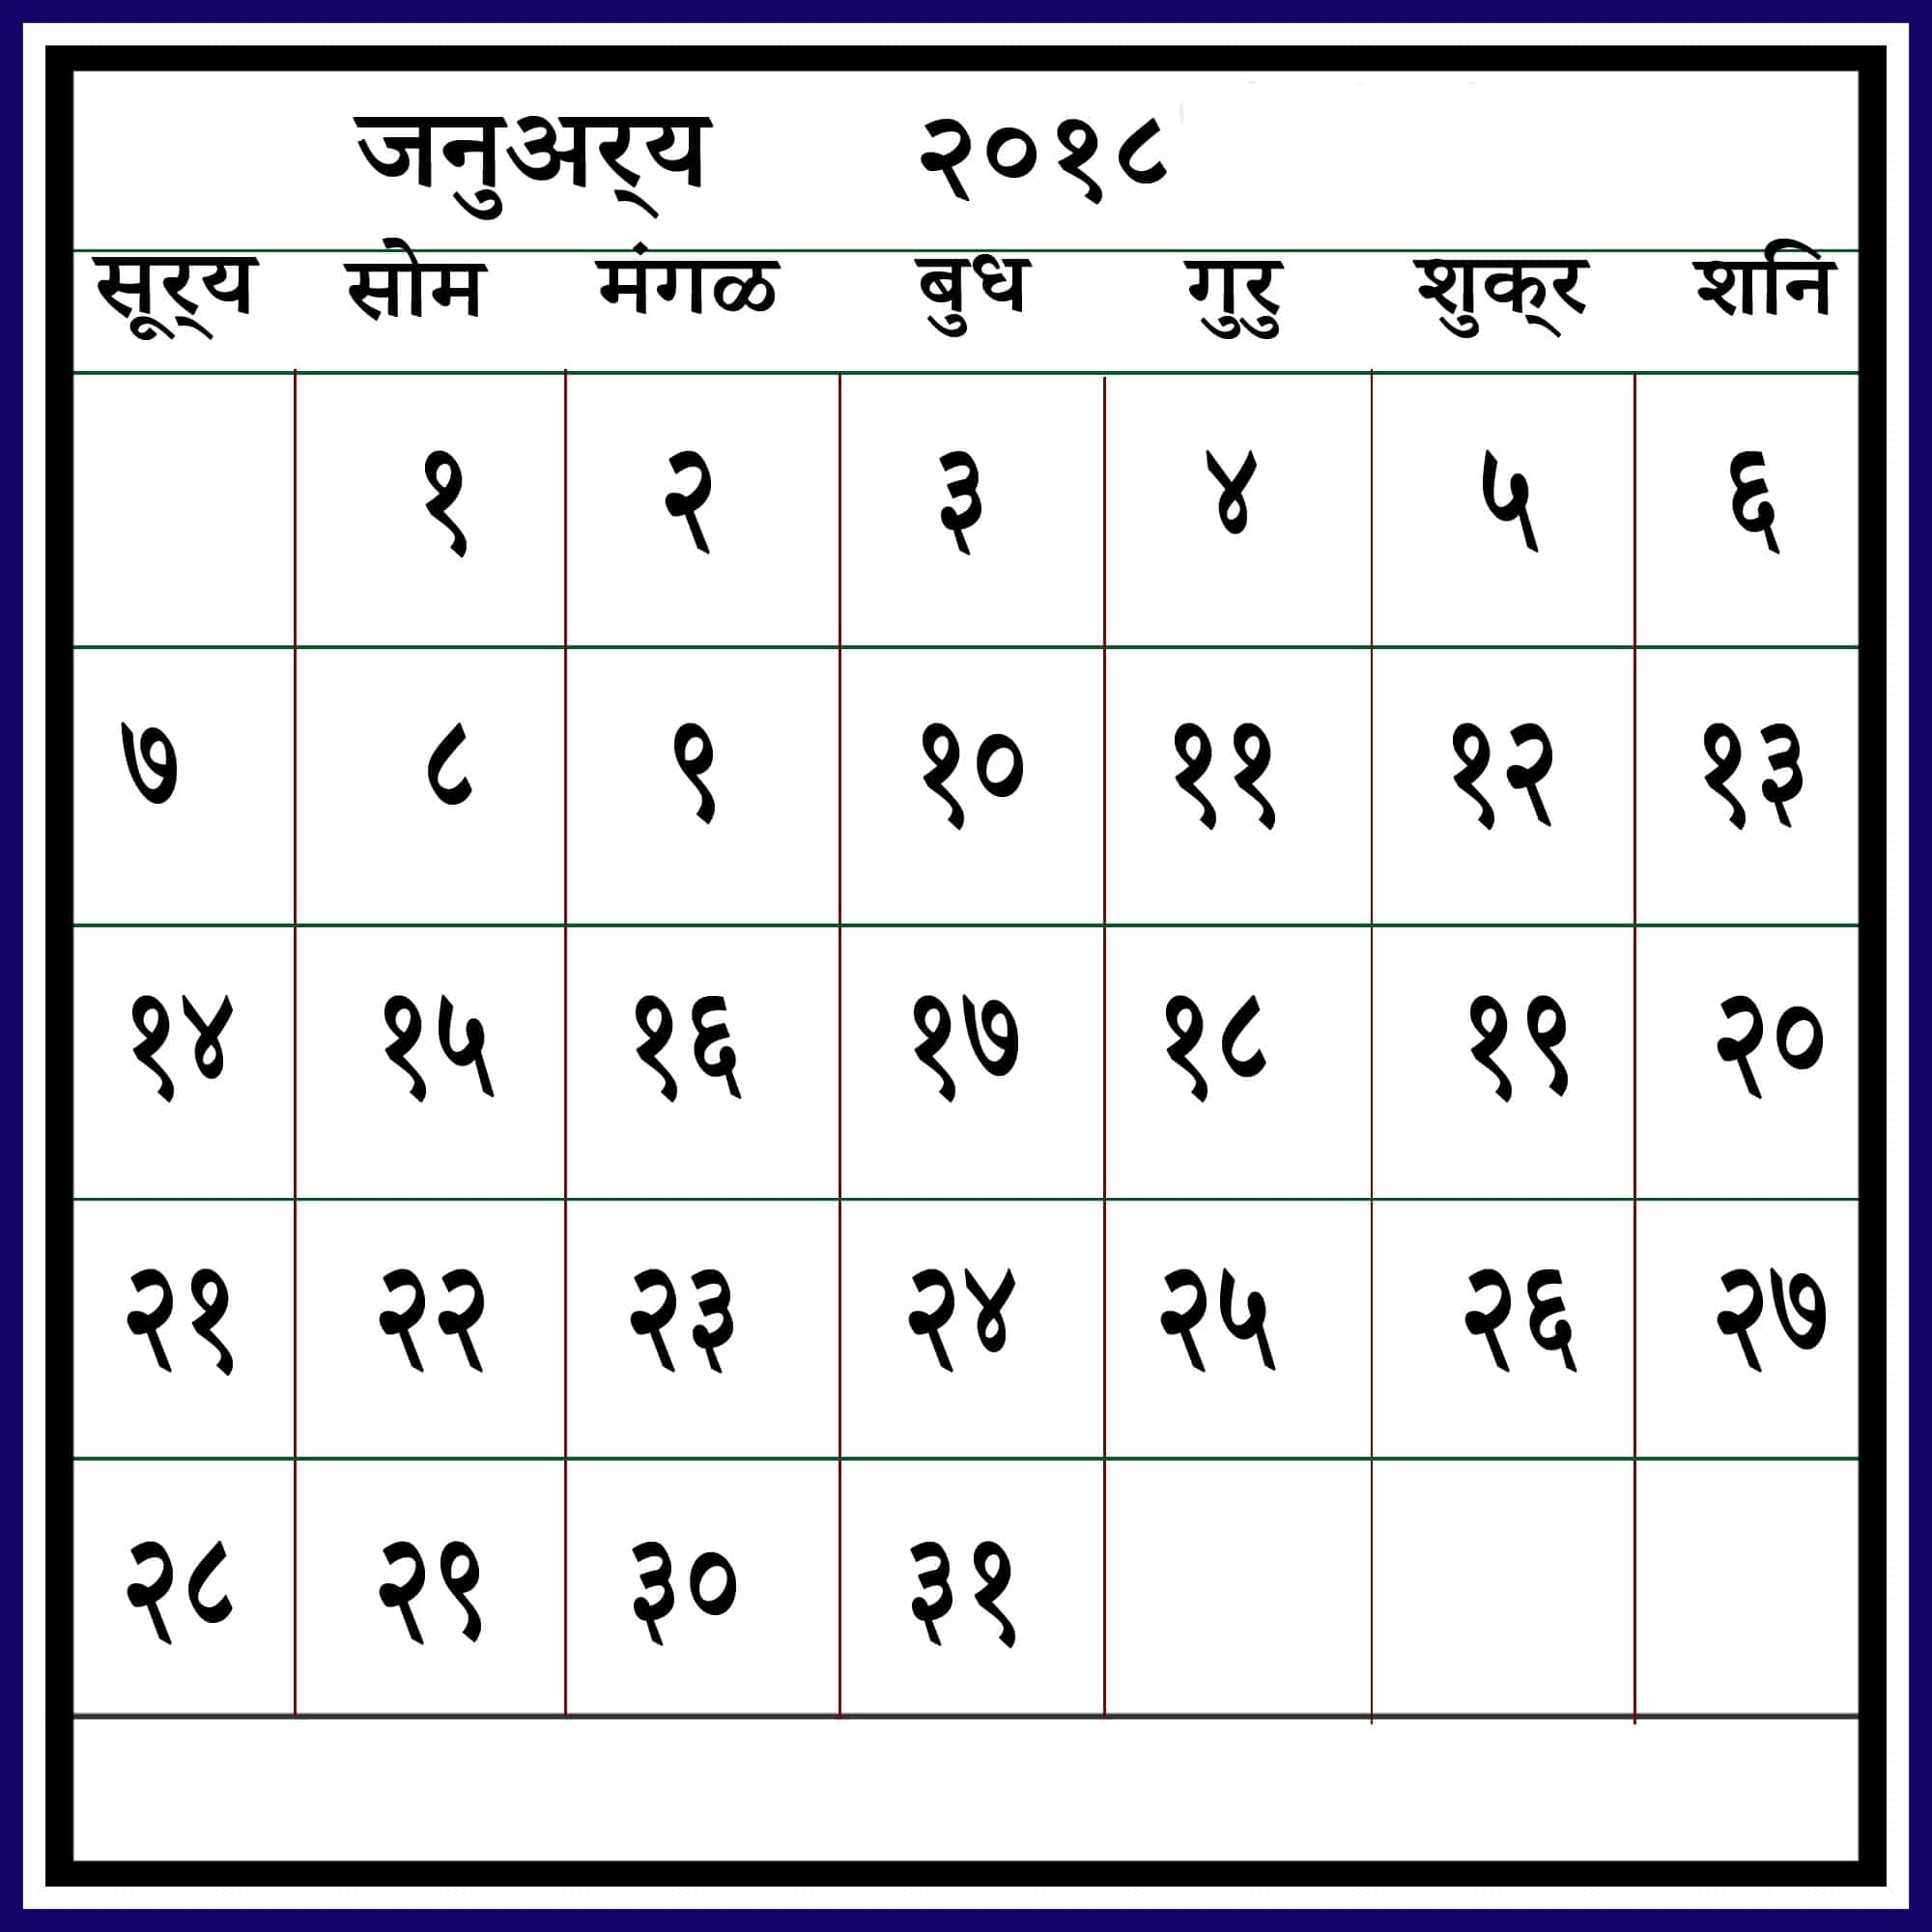 Kalnirnay January 2018 Calendar